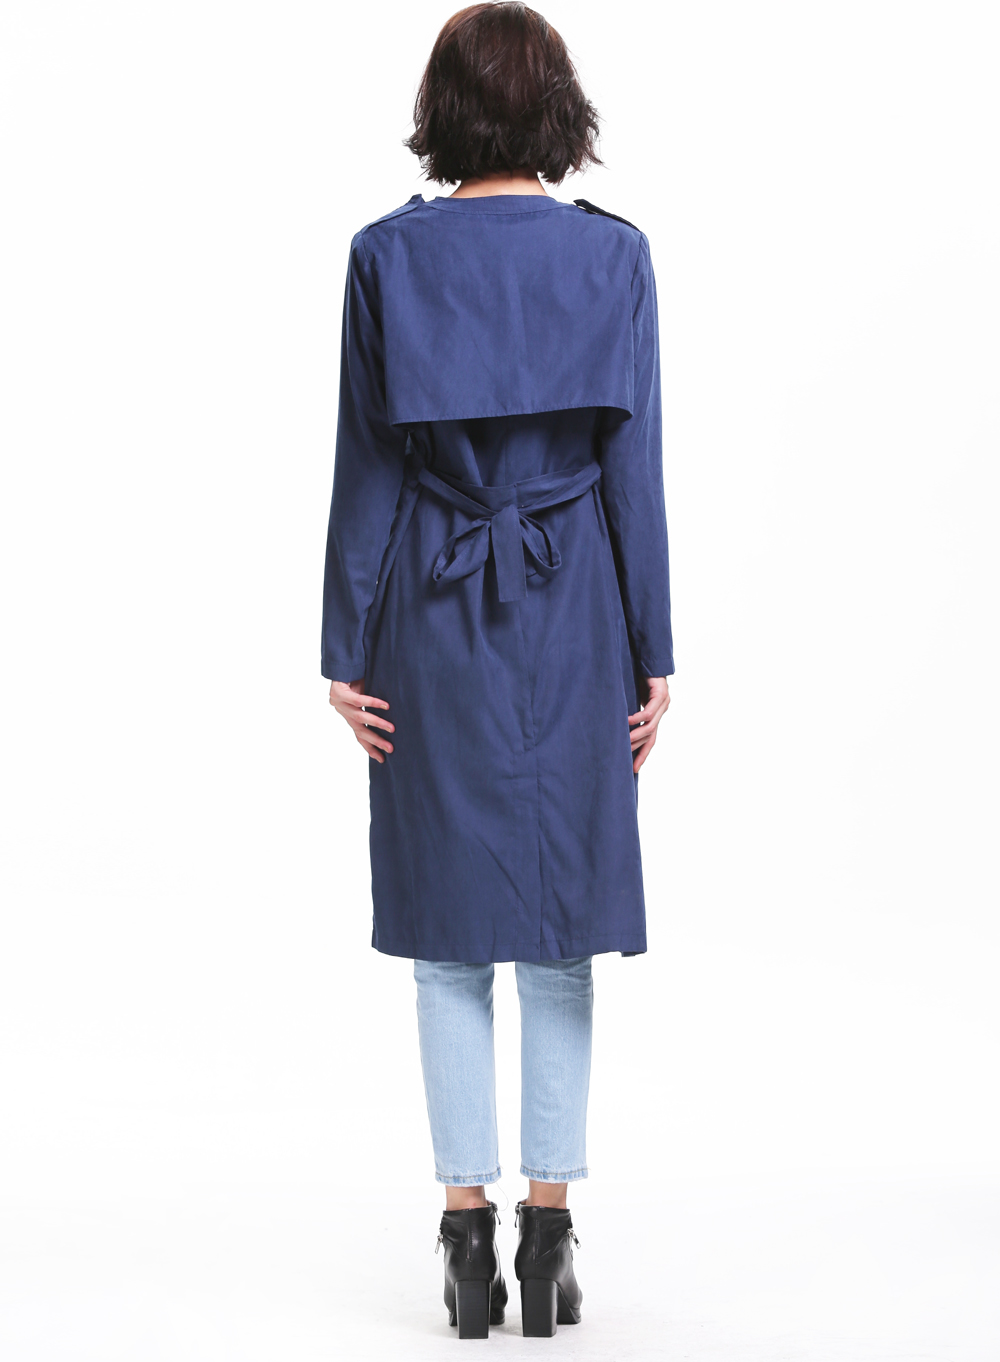 Navy Lapel Long Sleeve Pockets Trench Coat - Sheinside.com